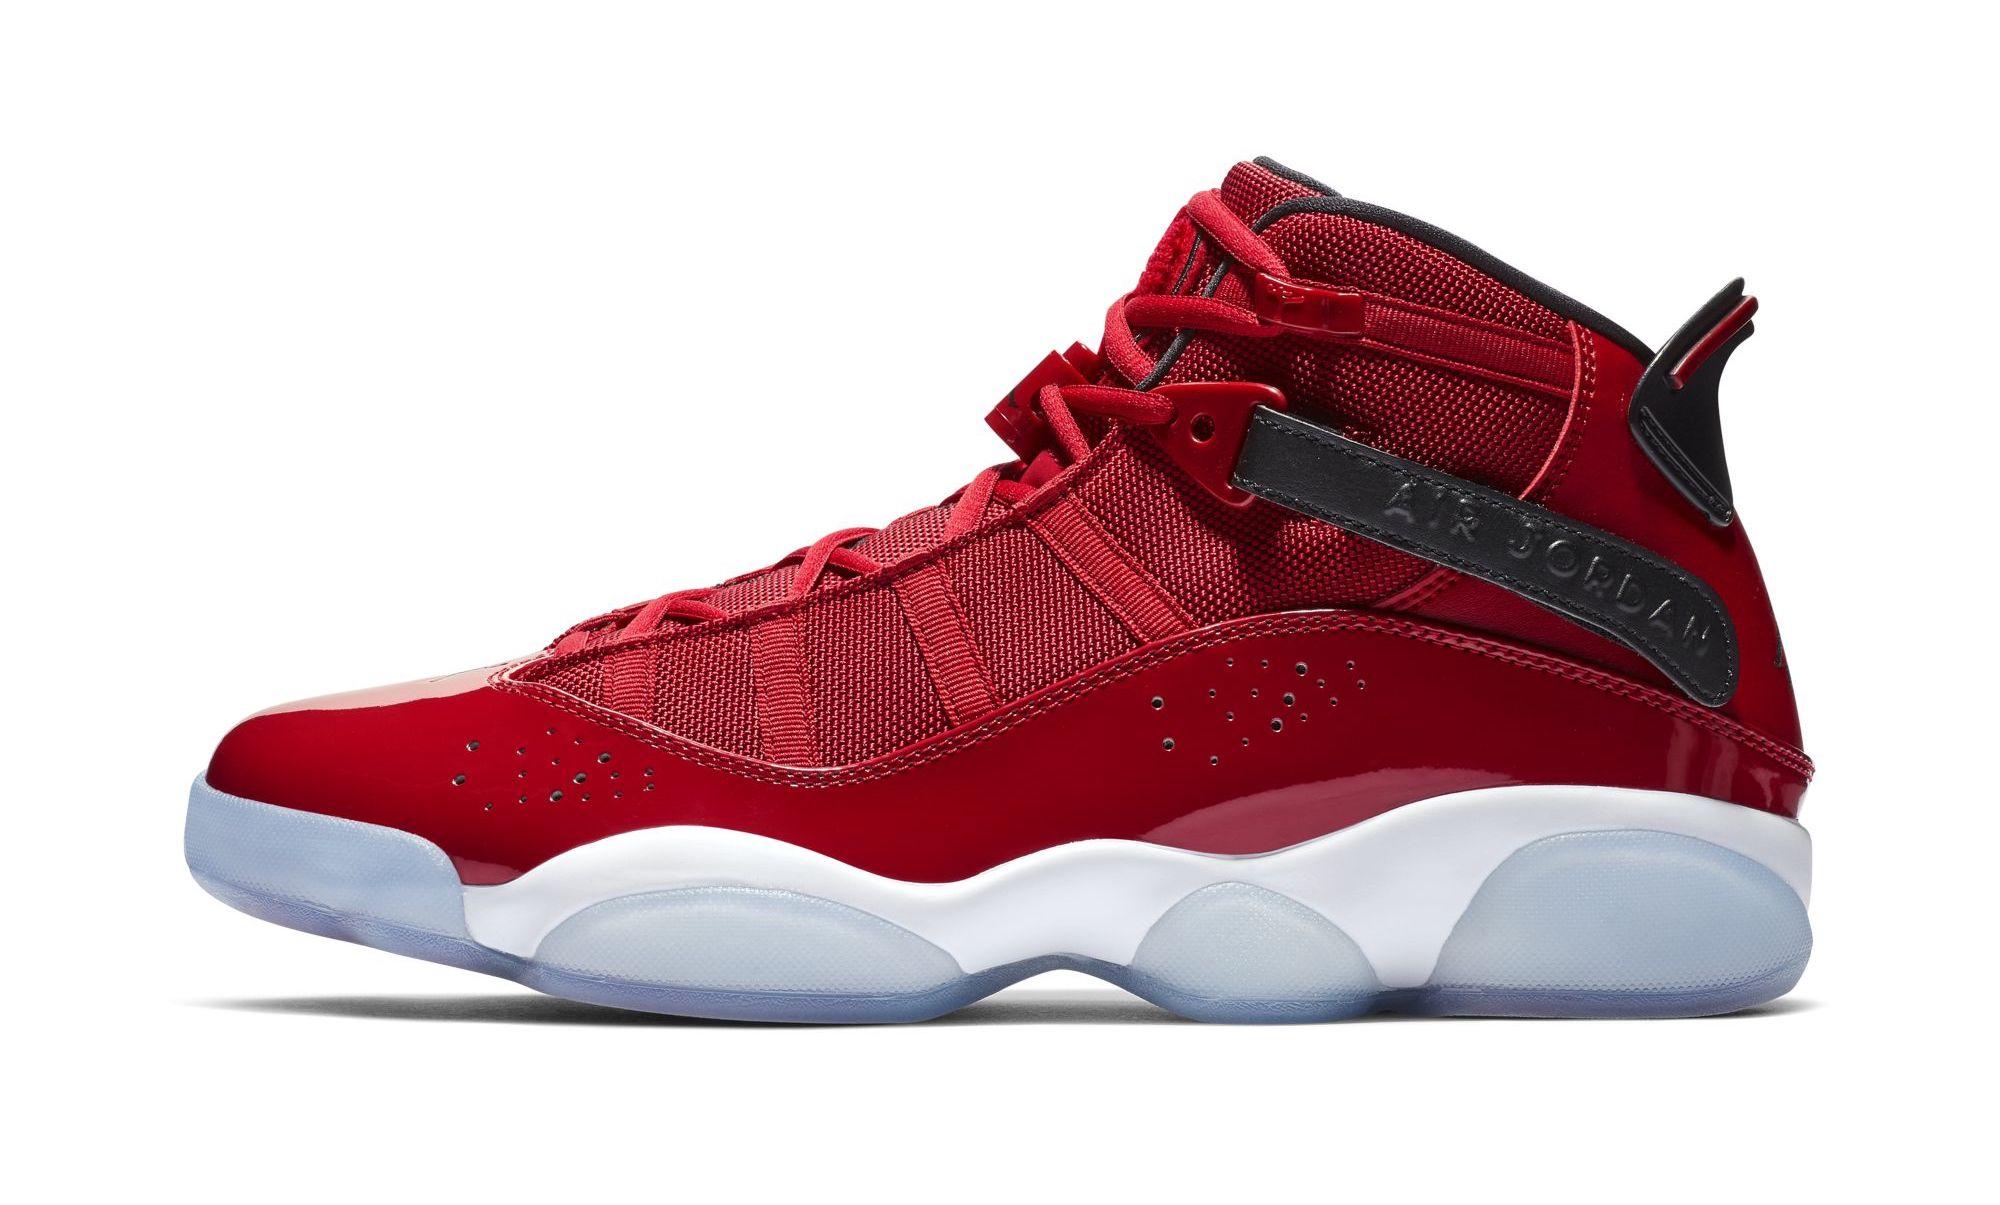 new arrivals fd3ce aeb61 Jordan 6 Rings University Red Coming Soon • KicksOnFire.com